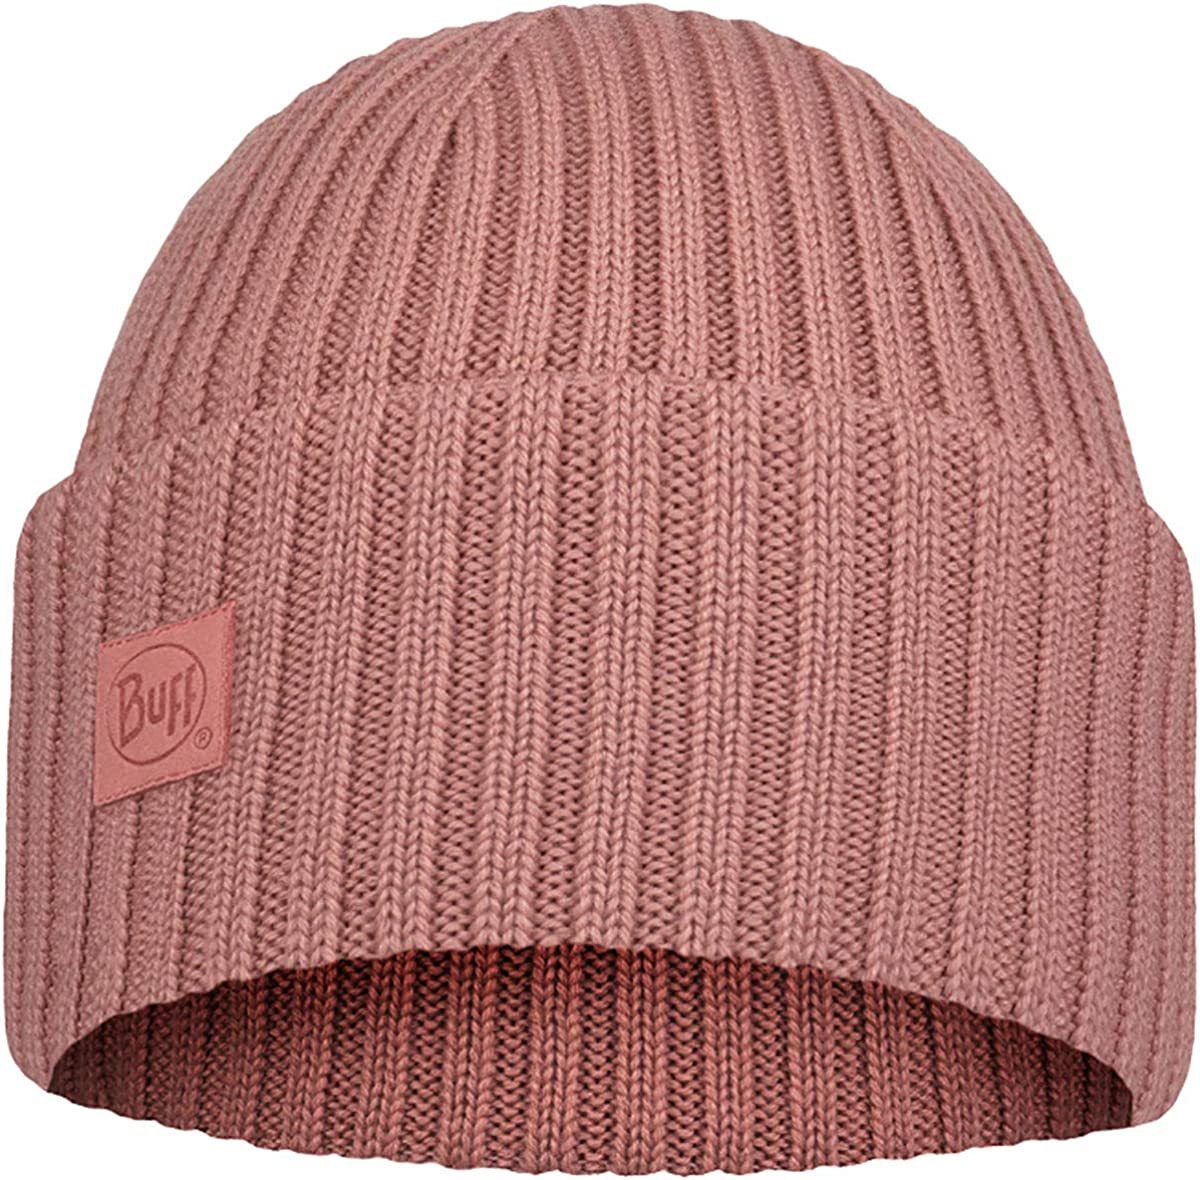 BUFF Adult Merino Wool Knitted Ervin Beanie Hats